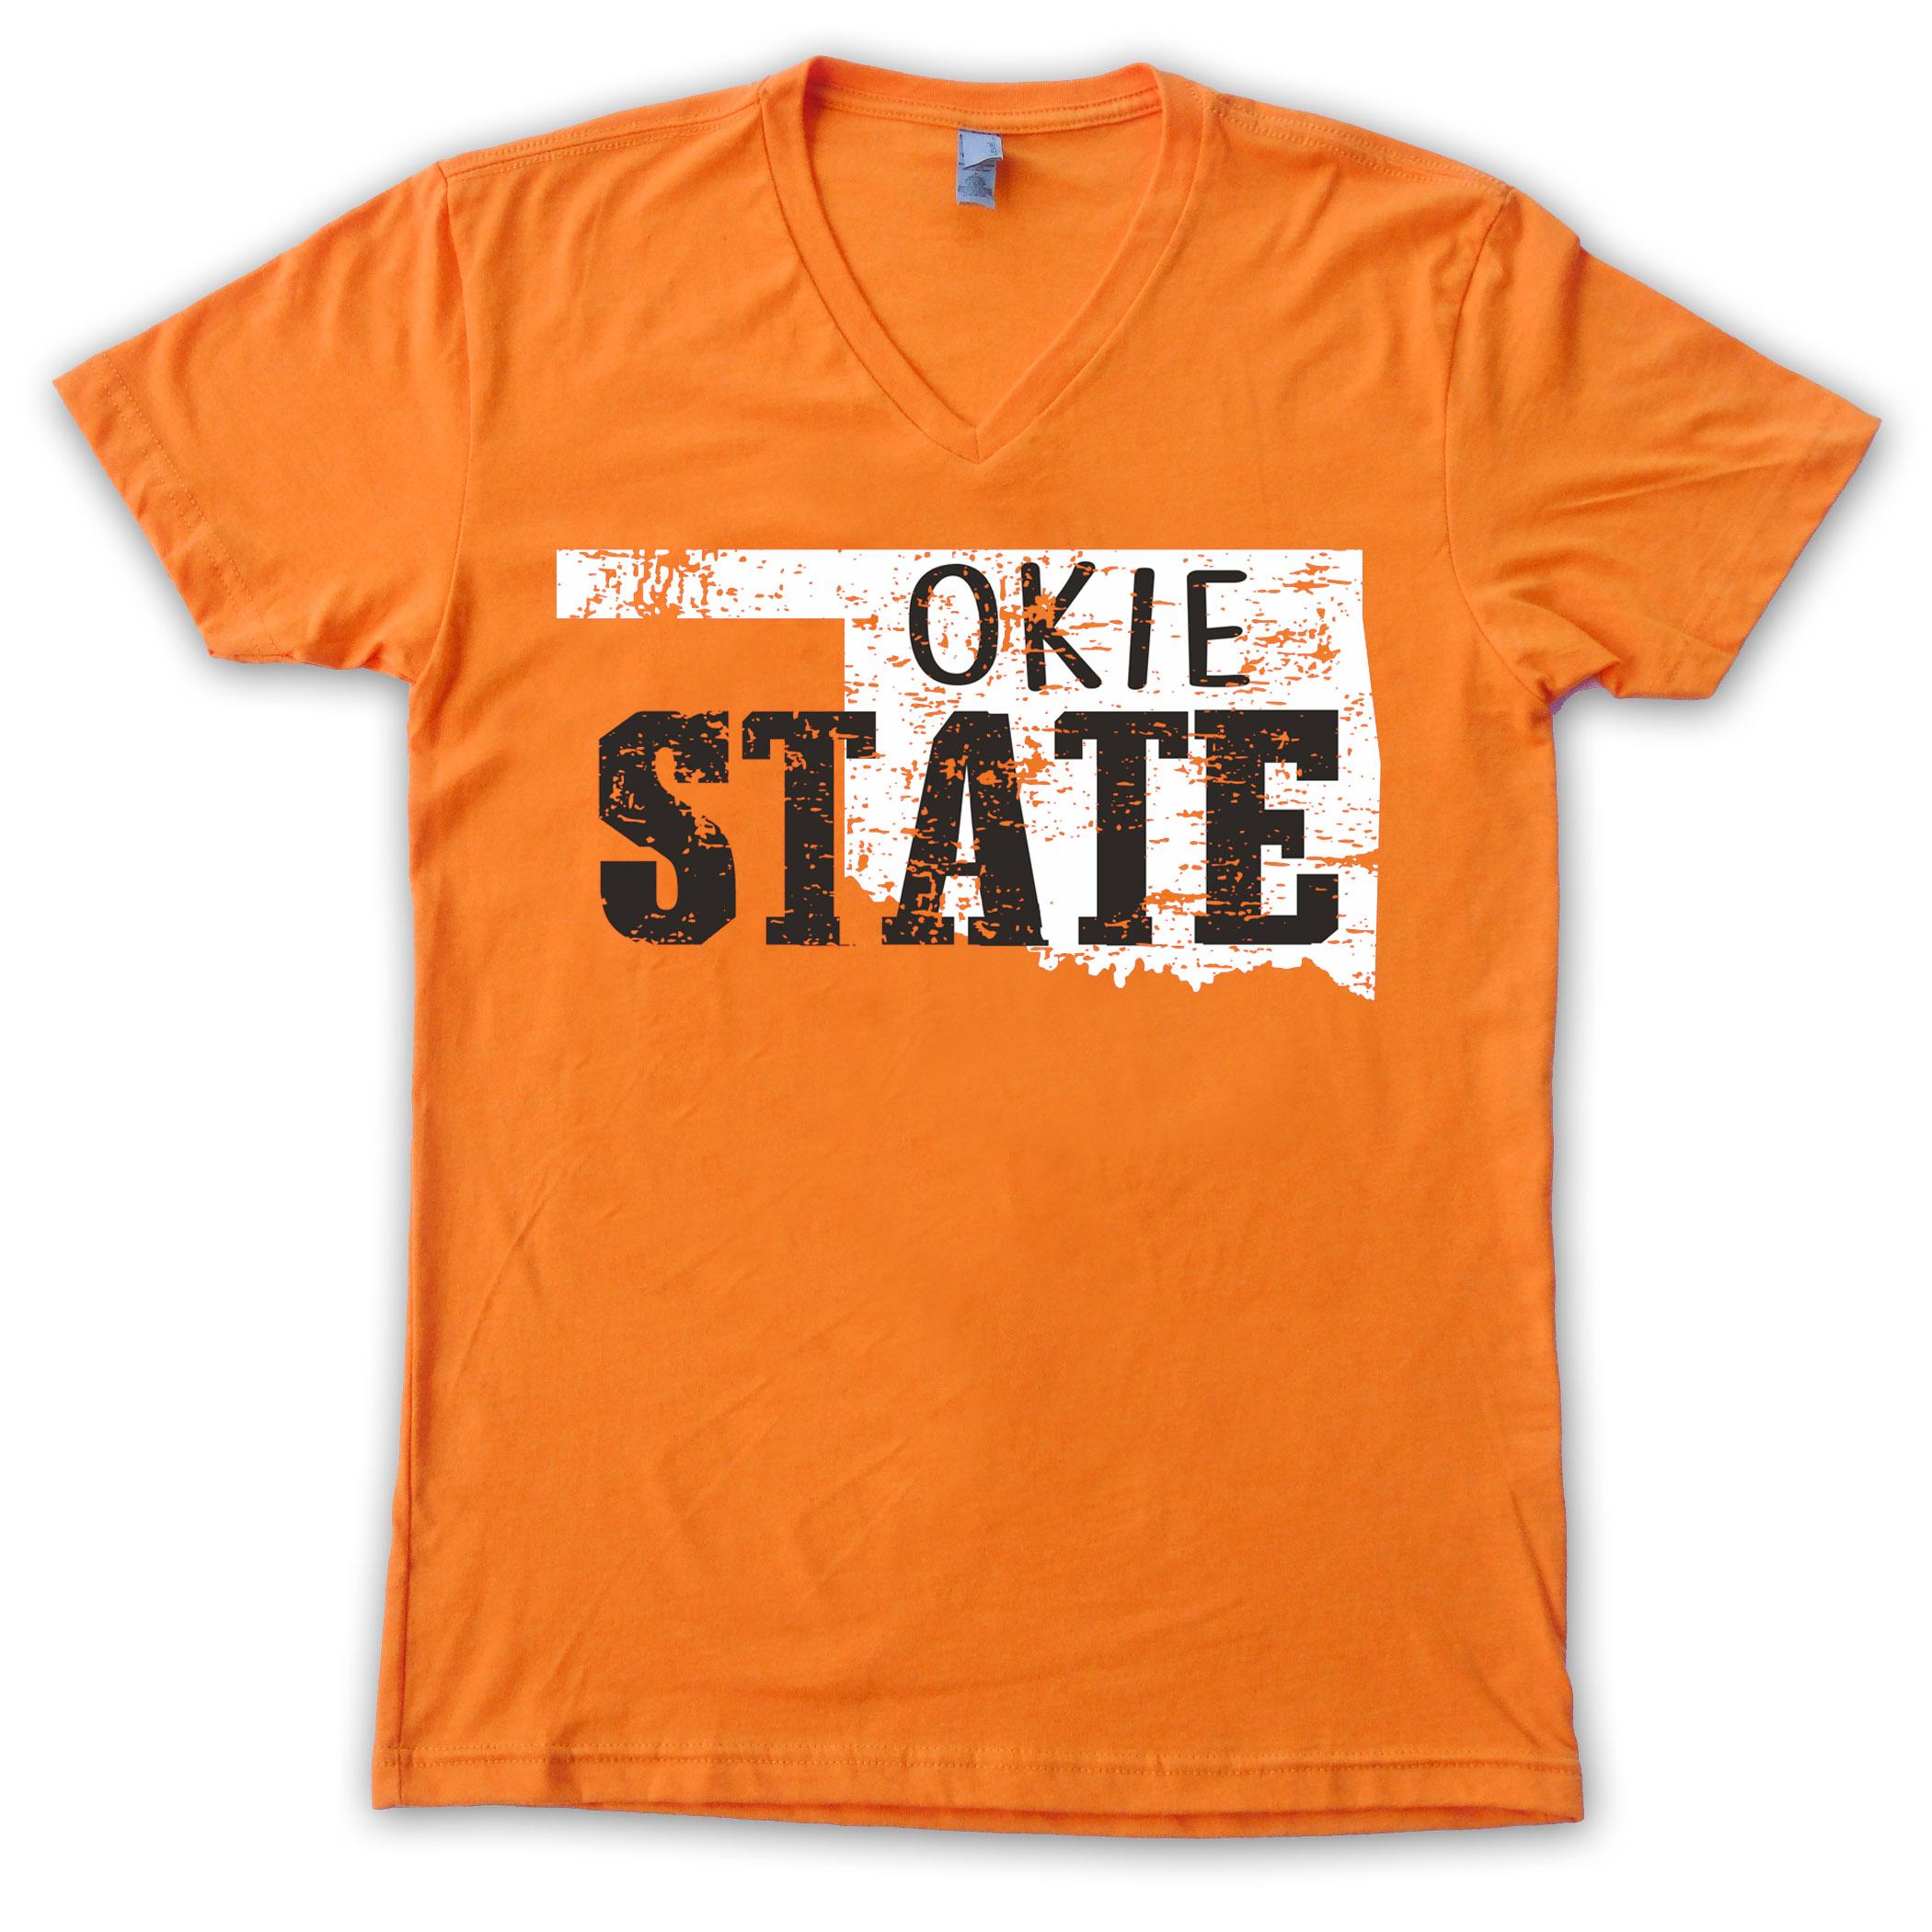 Okie State T-Shirt